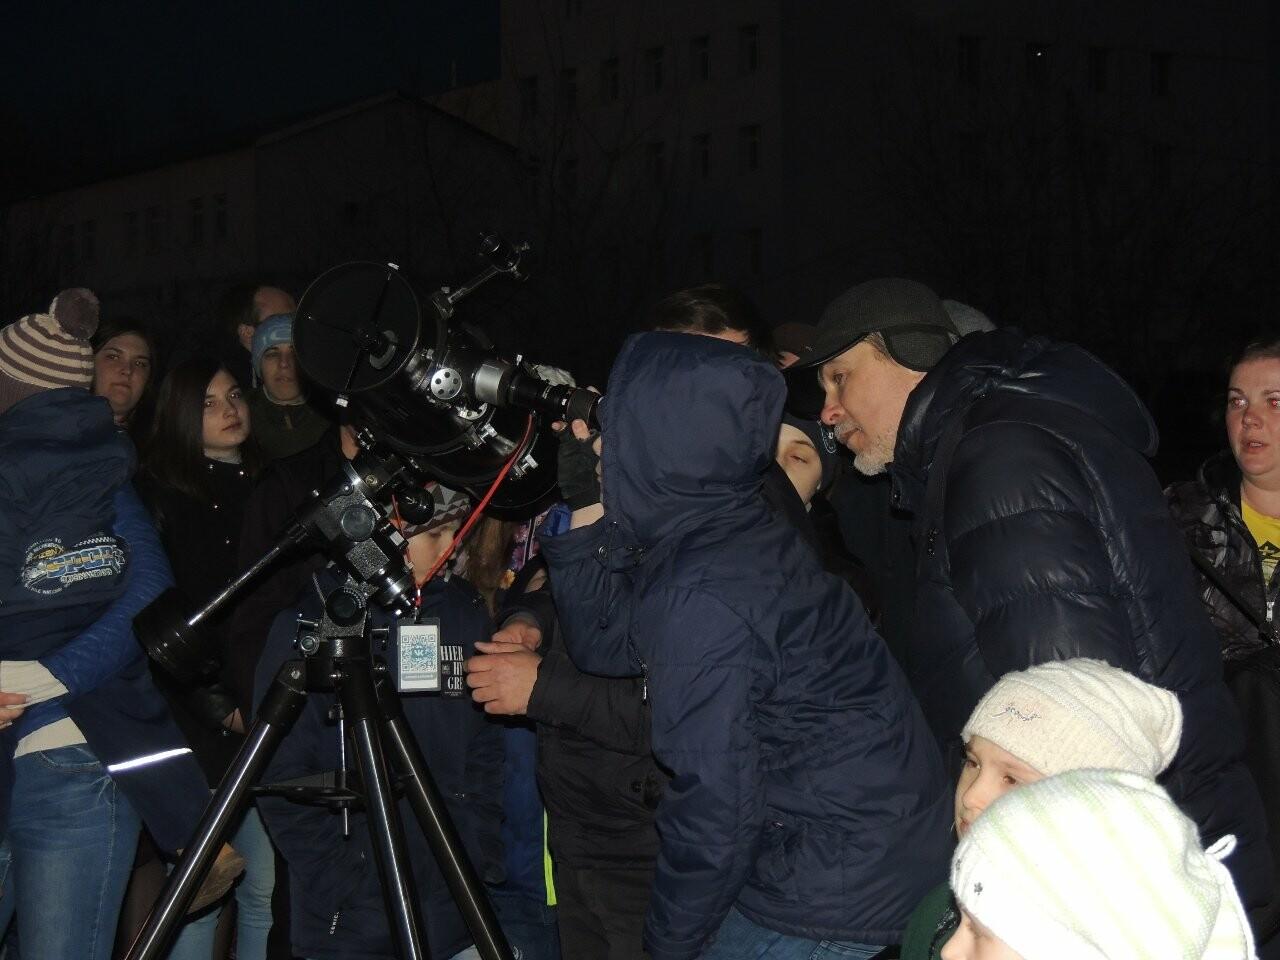 Тамбовчане отметили День космонавтики вместе с порталом Go68 и «Радио Дача», фото-4